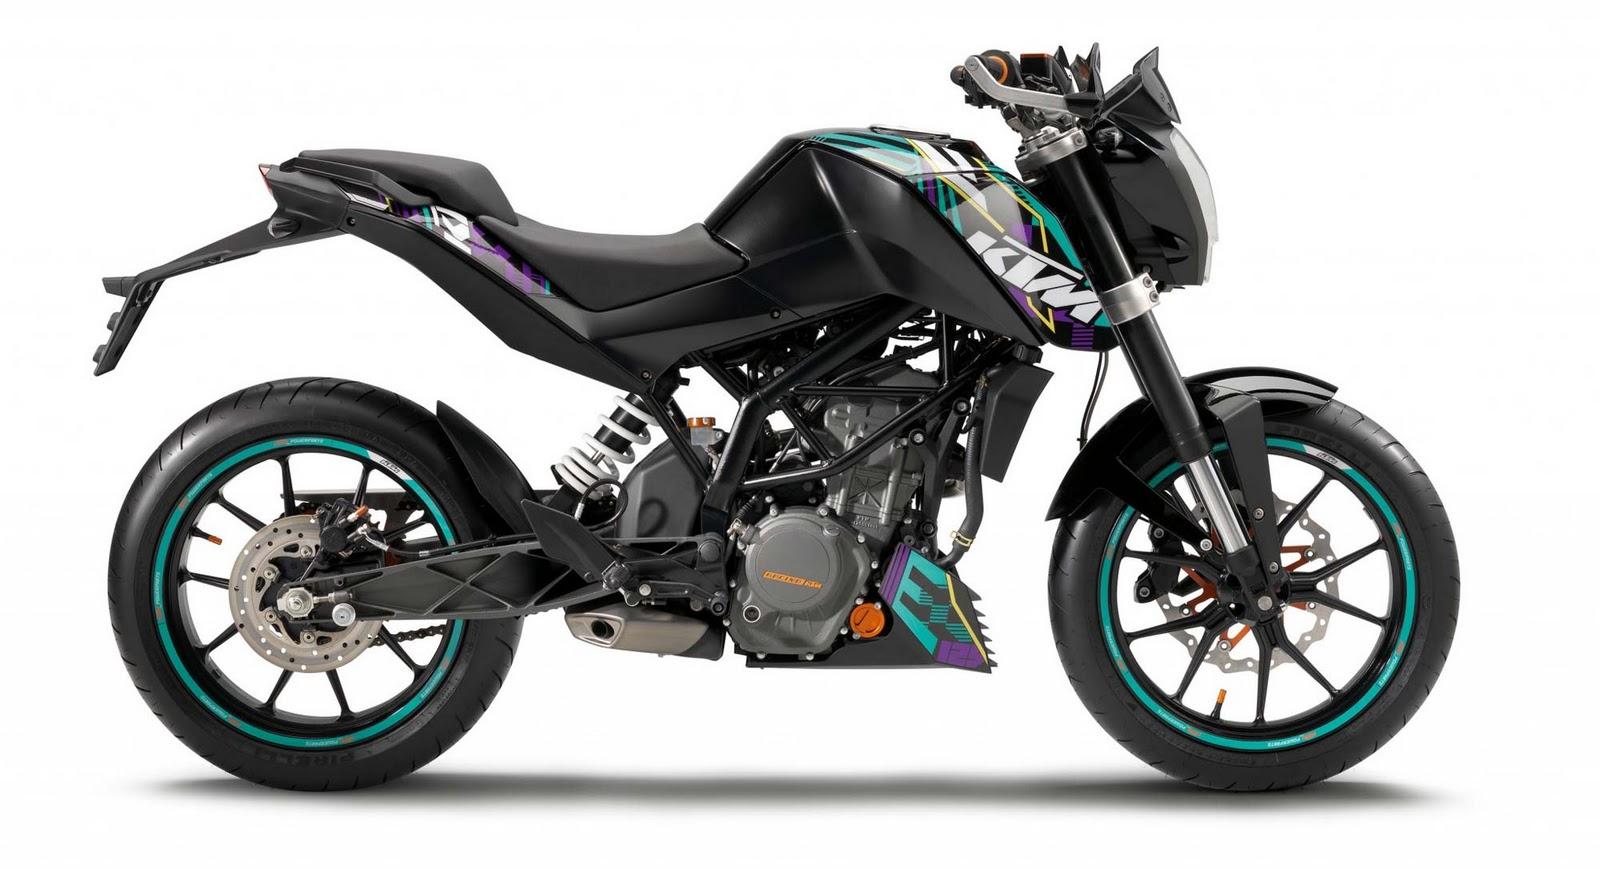 latest bike: bajaj duke ktm bike picture with all available colors